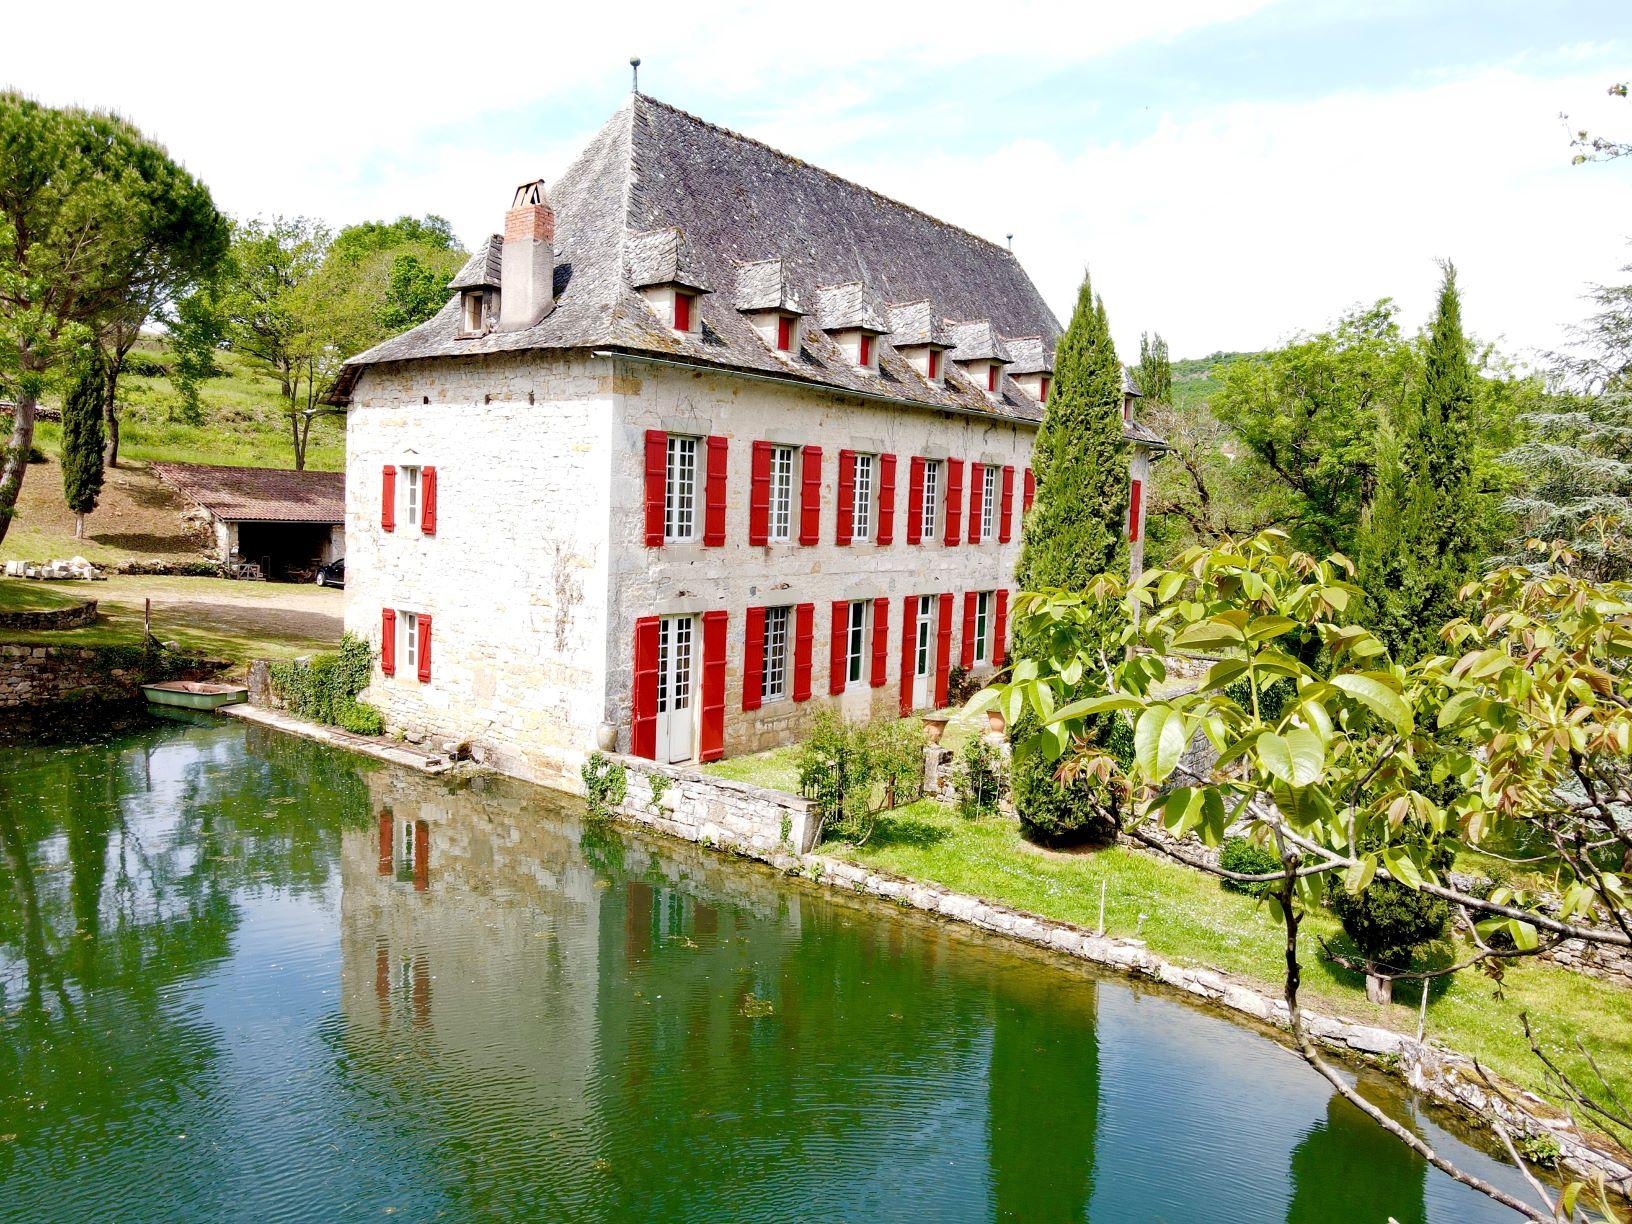 Moulin de Filhol - photo Marc Henri Figuier